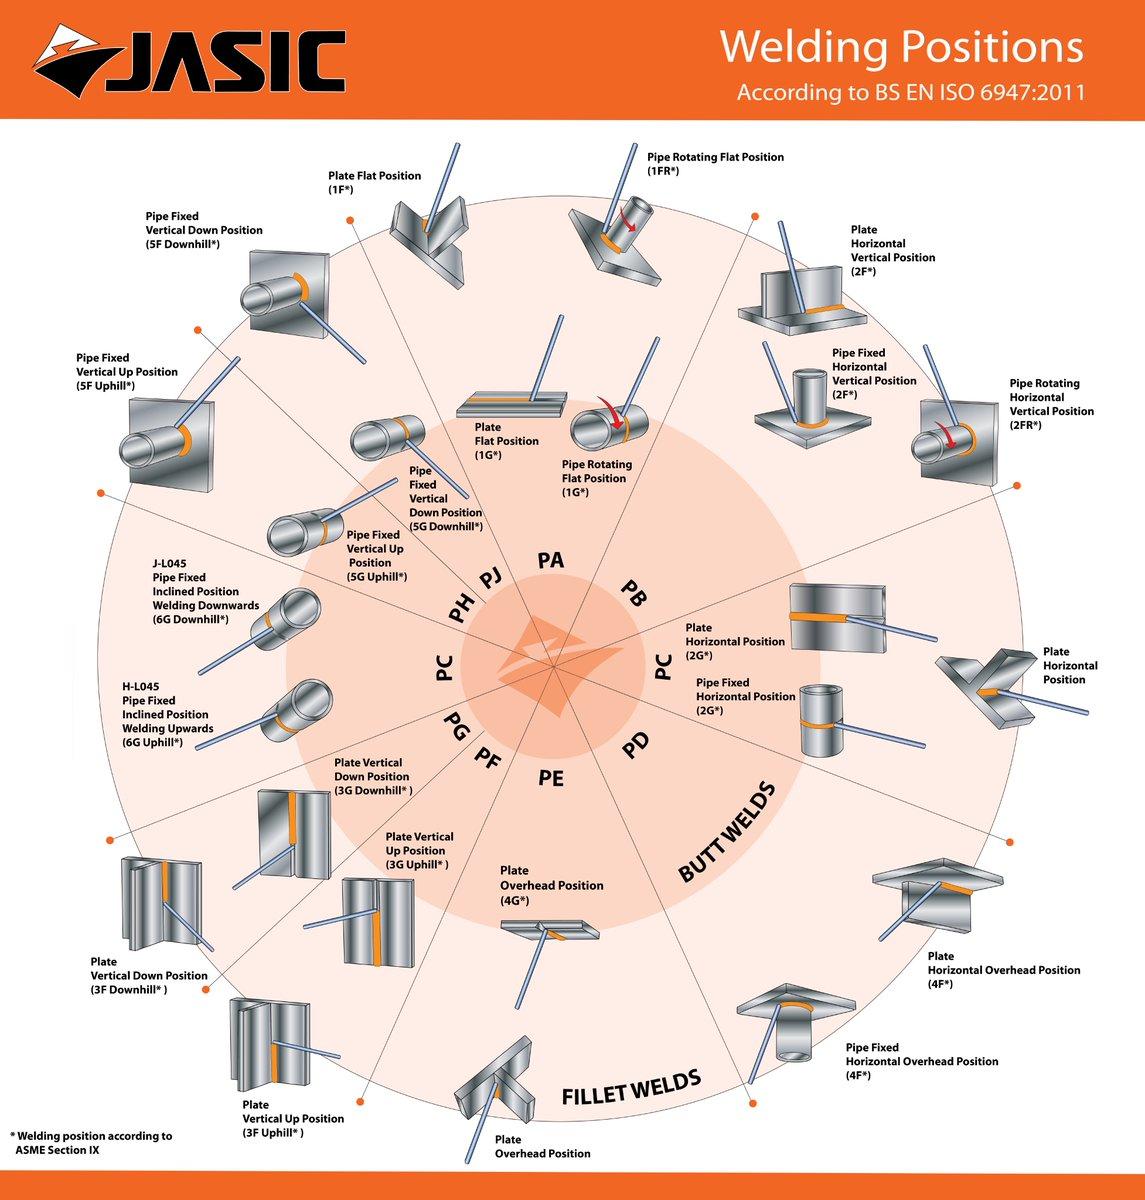 hight resolution of jasic welding inverters on twitter welding positions chart click to enlarge welding inverter